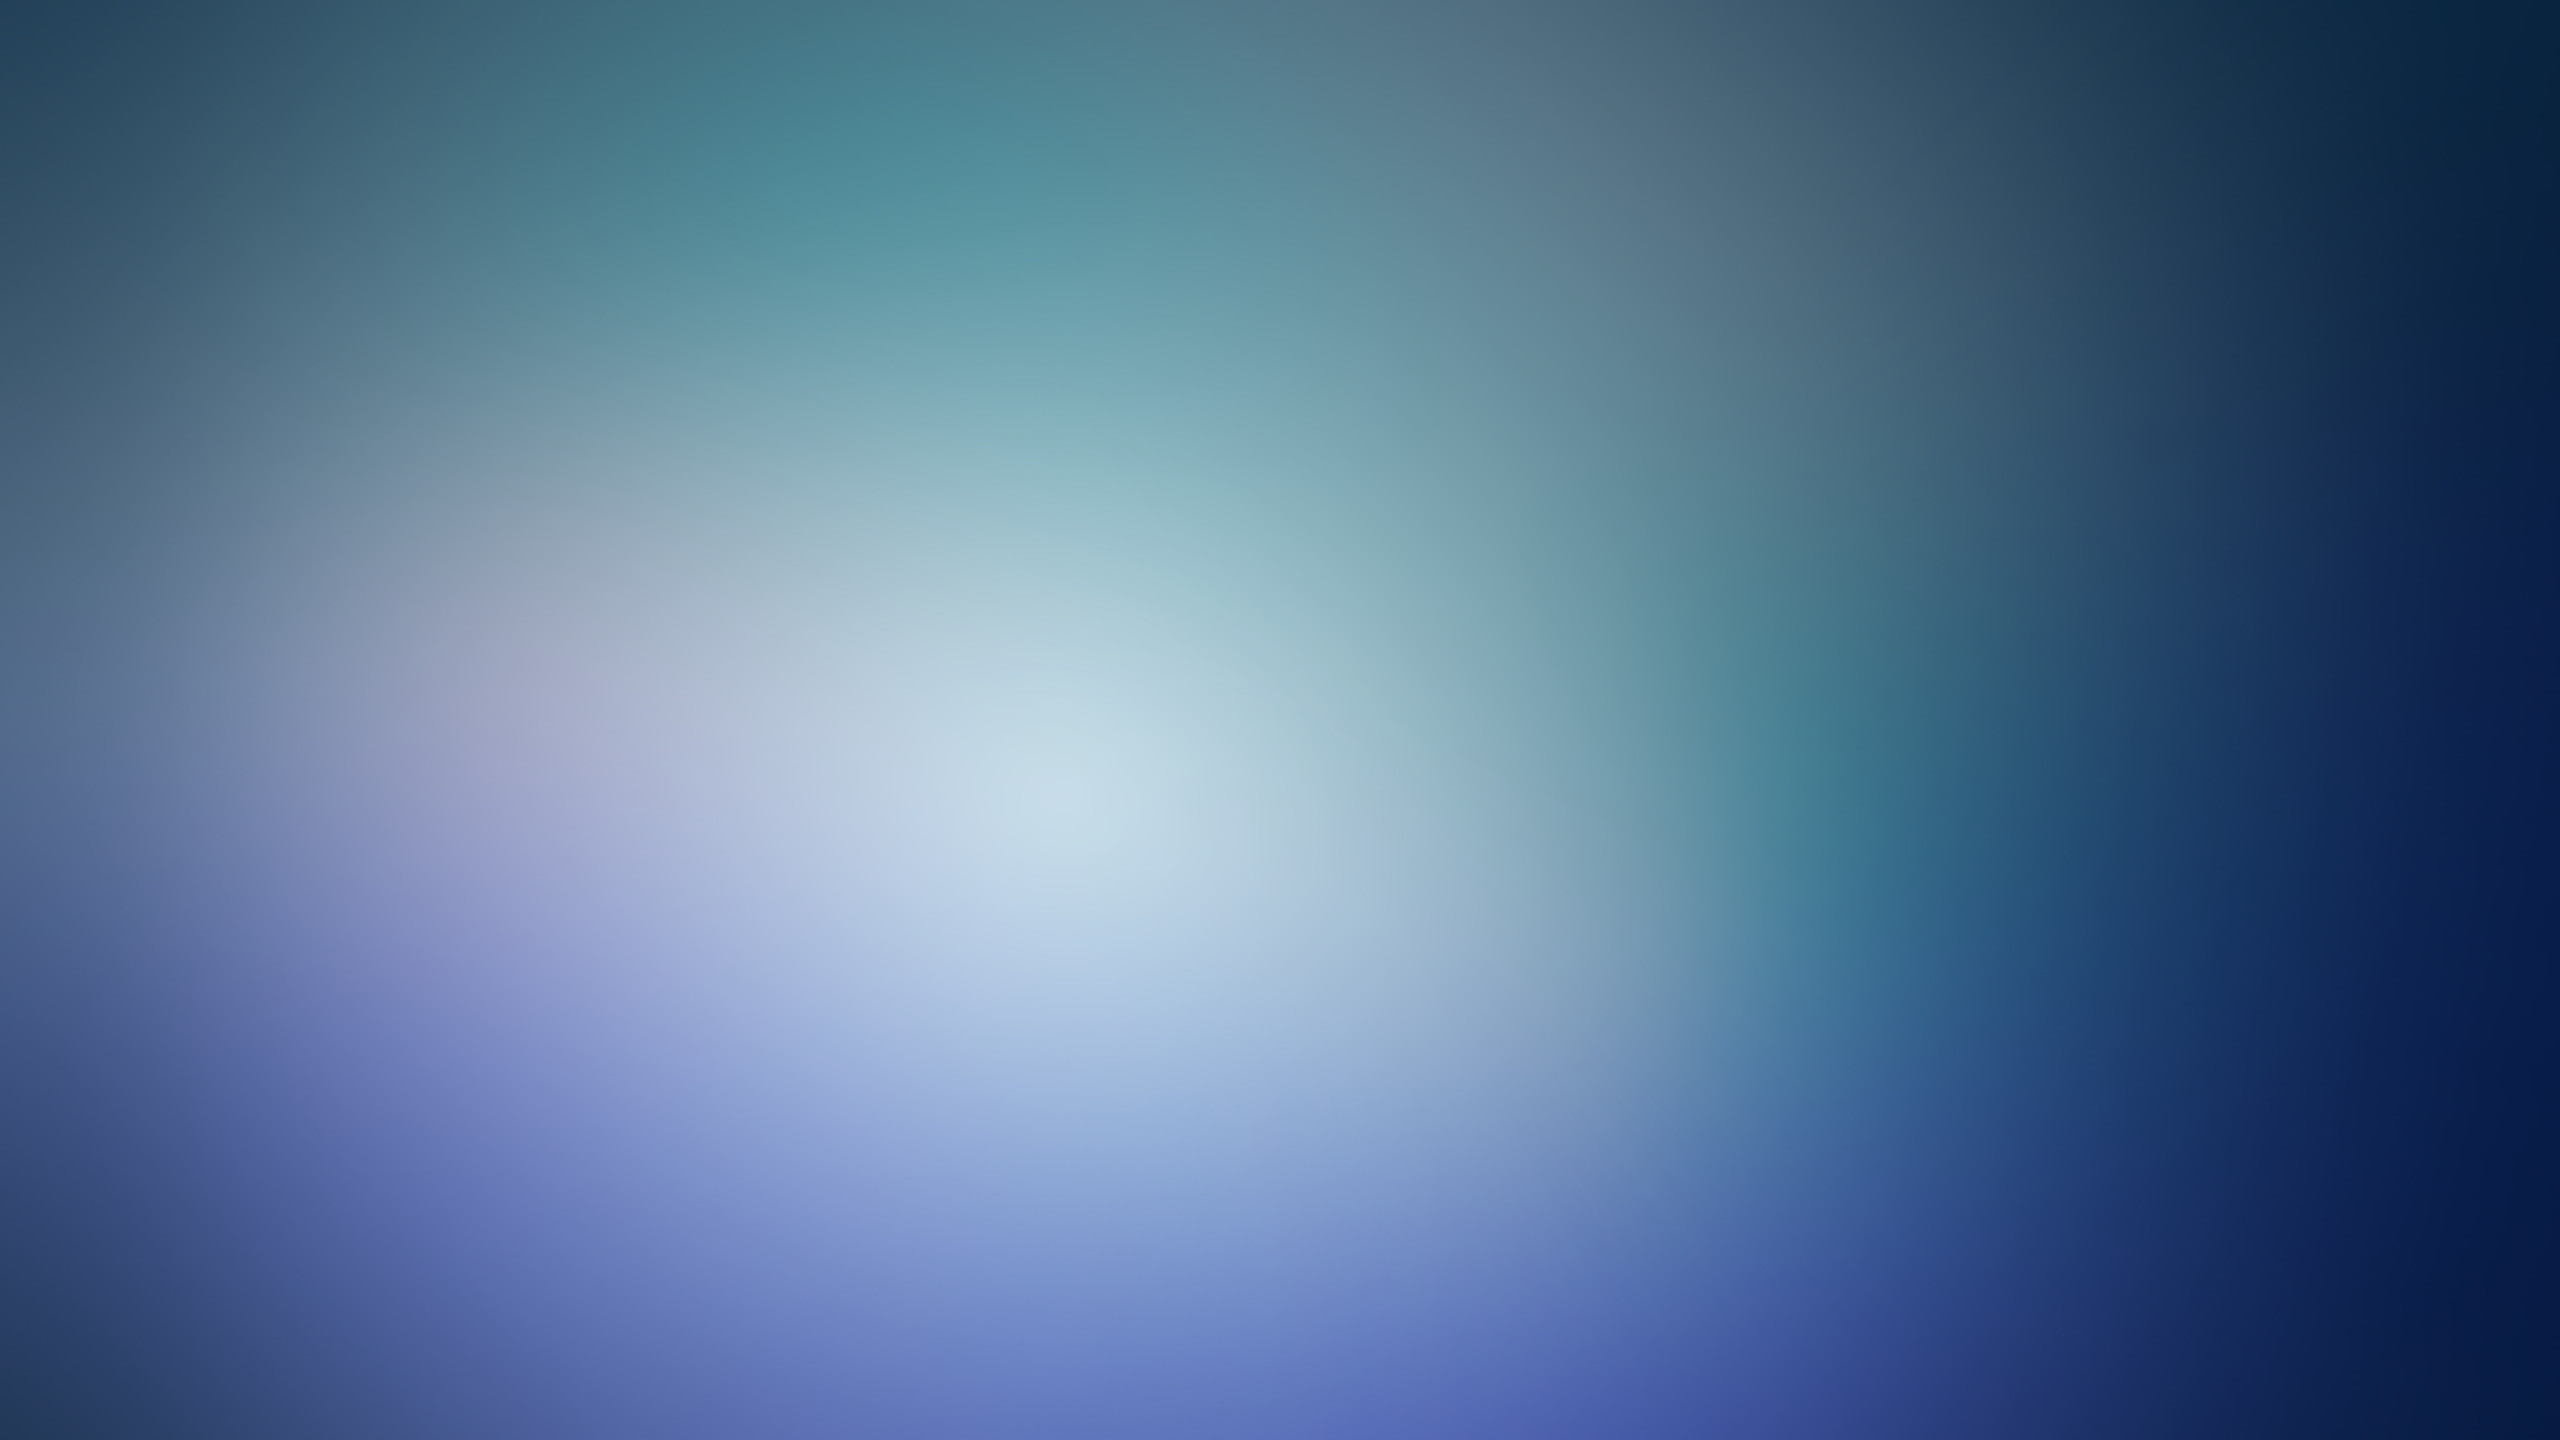 … gradient HD Wallpaper Blue …